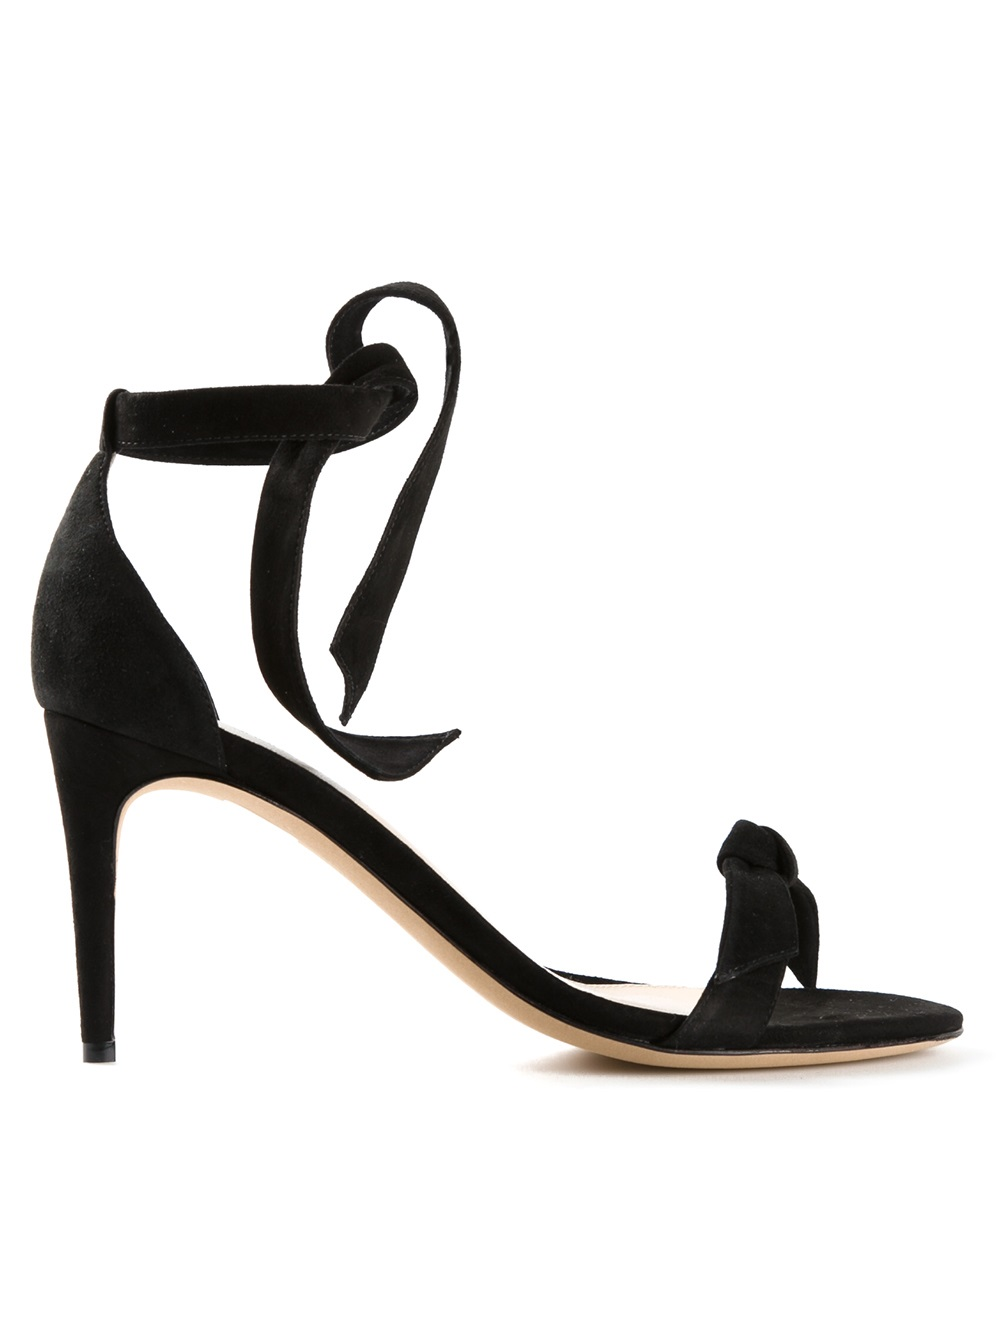 Alexandre Birman Knotted Sandal - The Webster - Farfetch.com